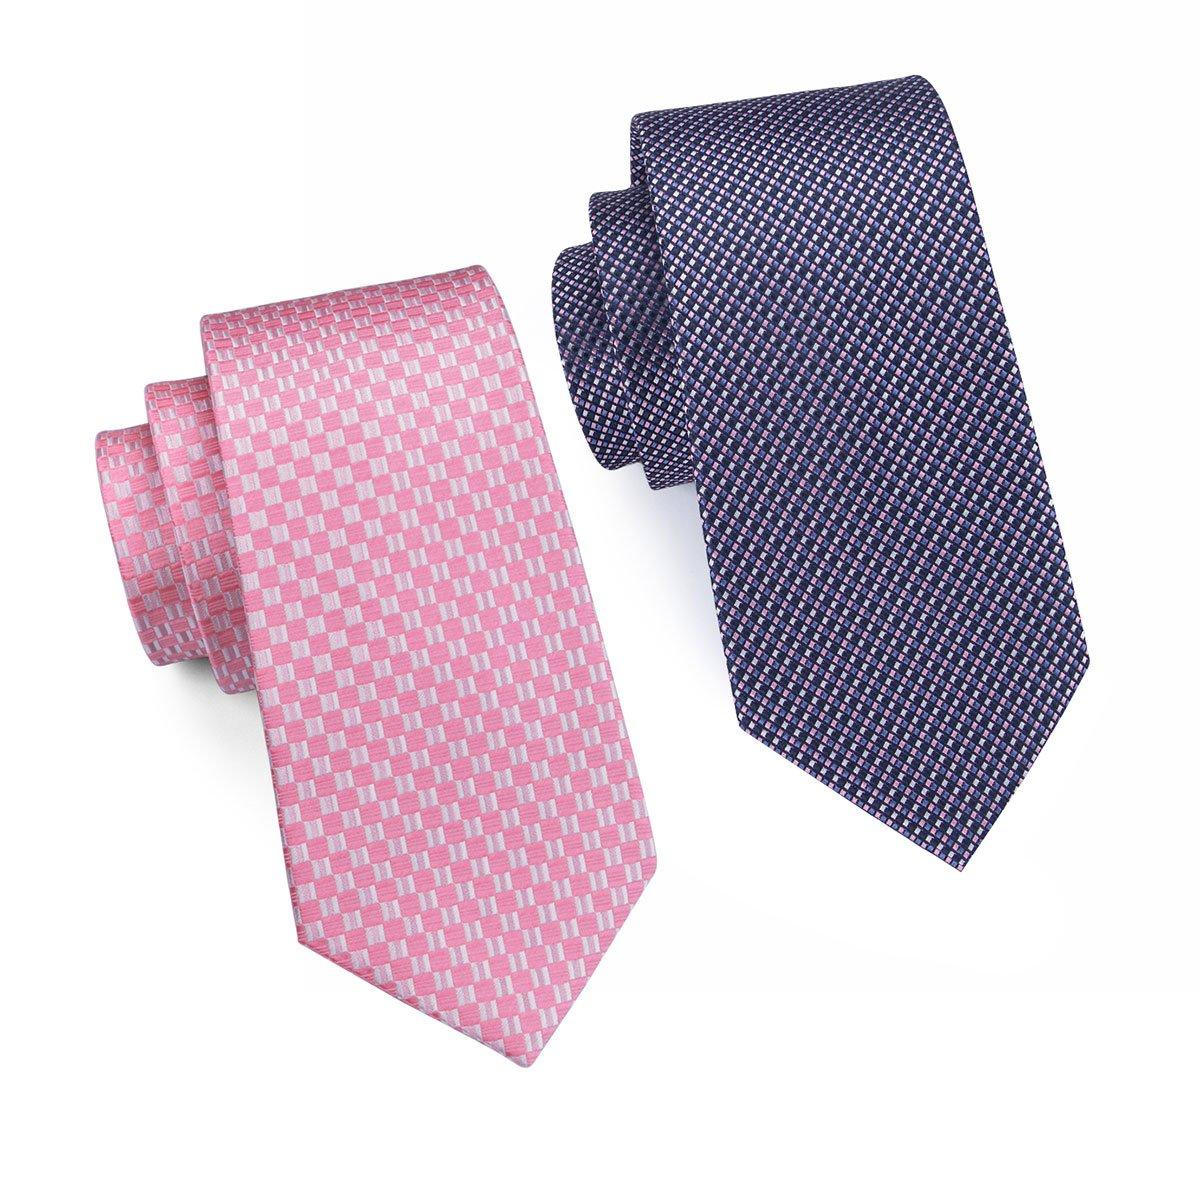 Hi-Tie ACCESSORY メンズ B07B3WZ1G6 Width 8.5cm 2 Ties Romantic Width 8.5cm 2 Ties Romantic